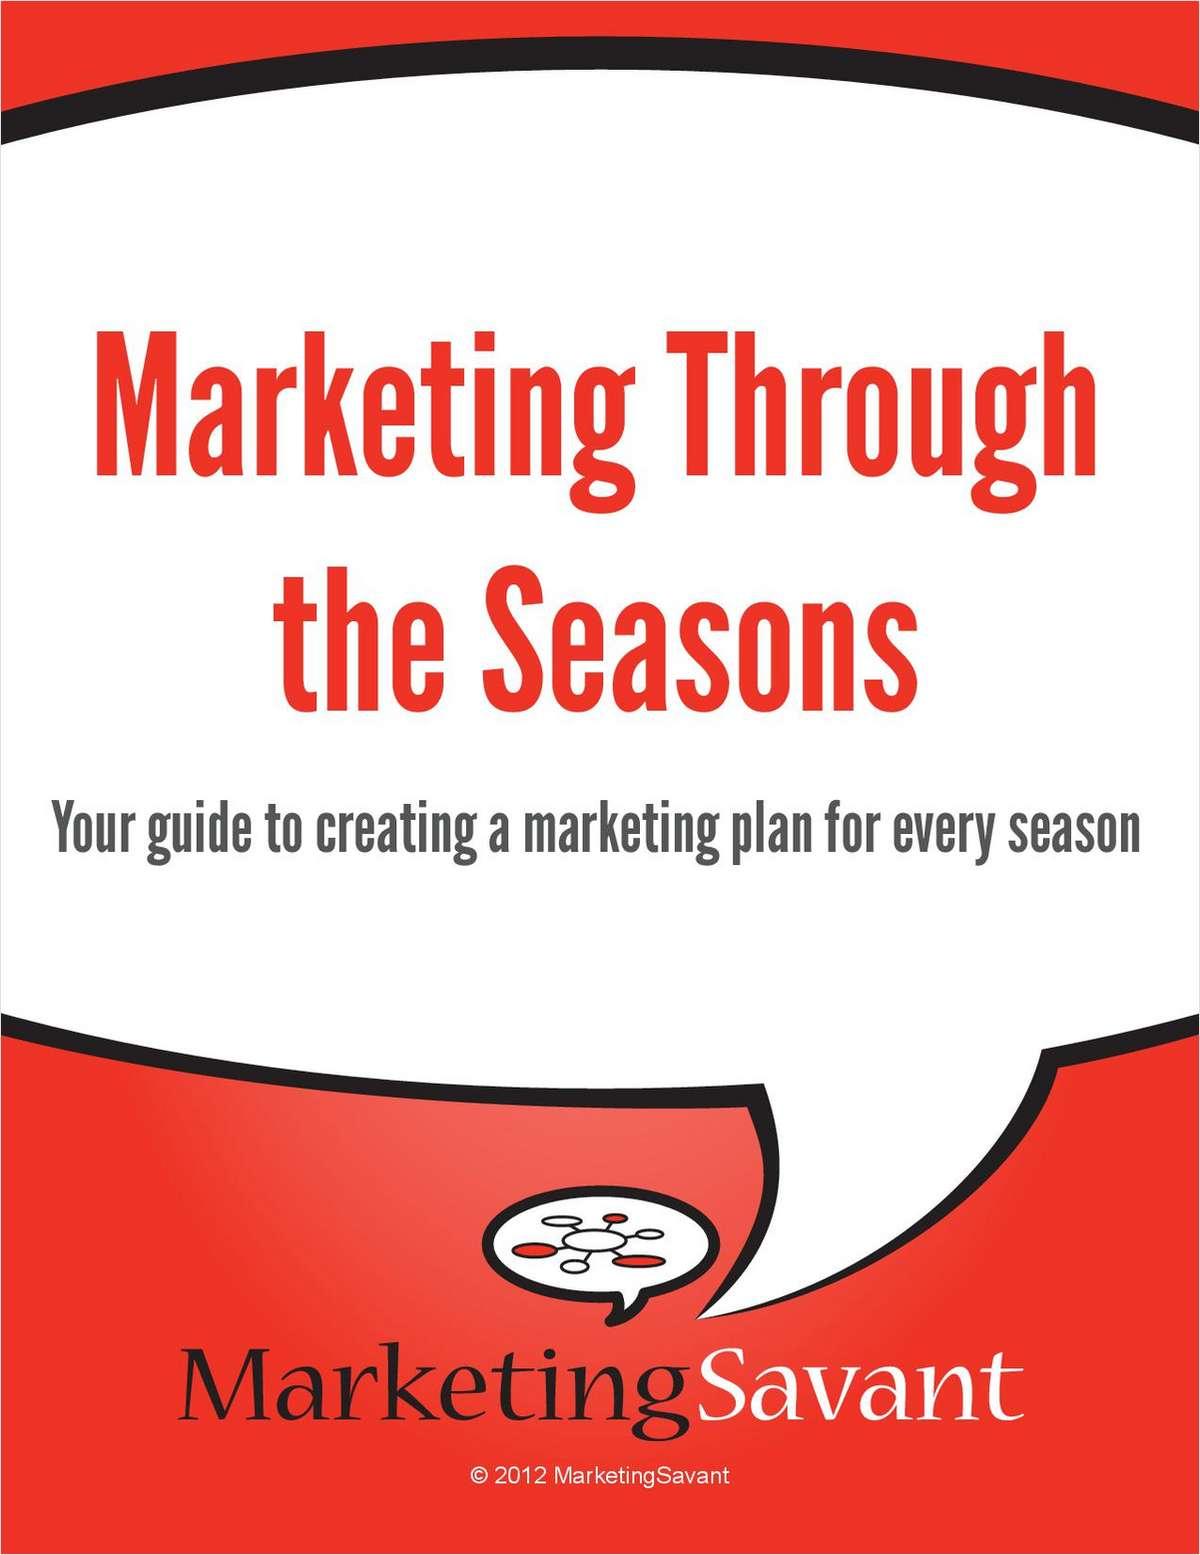 Marketing Through the Seasons